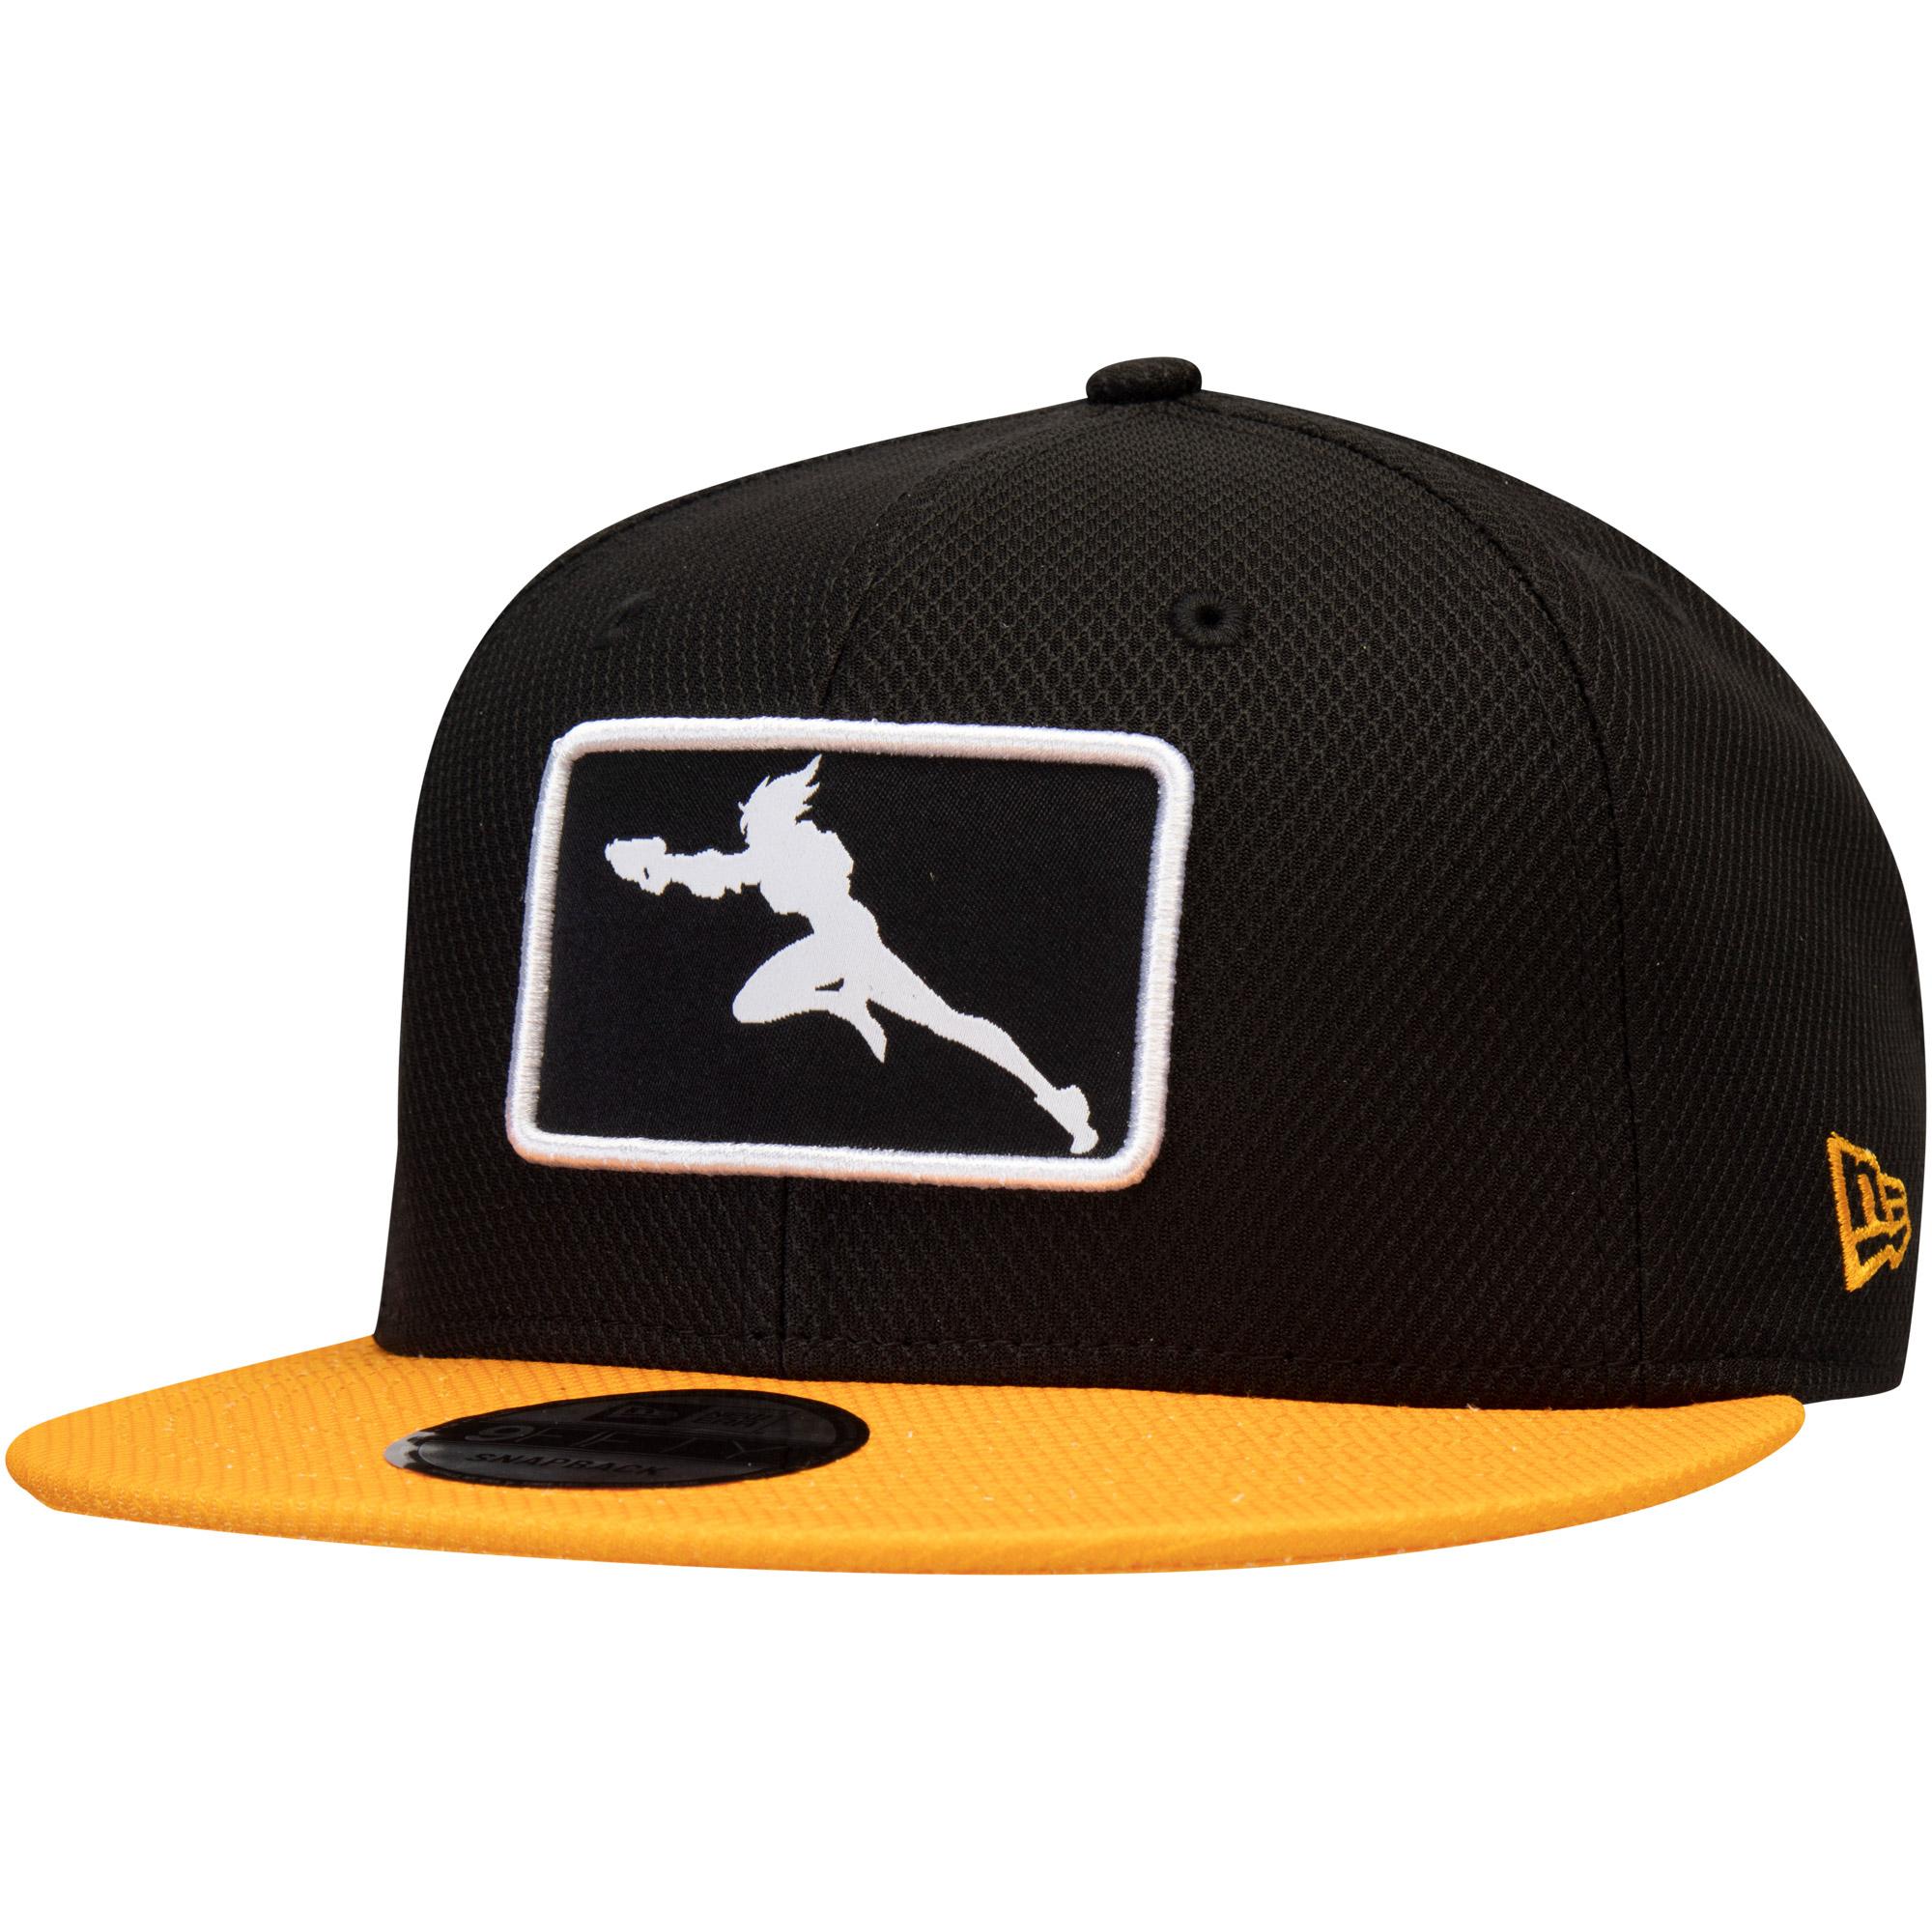 Overwatch League New Era Franchise Logo Snapback Hat - Black/Yellow - OSFA